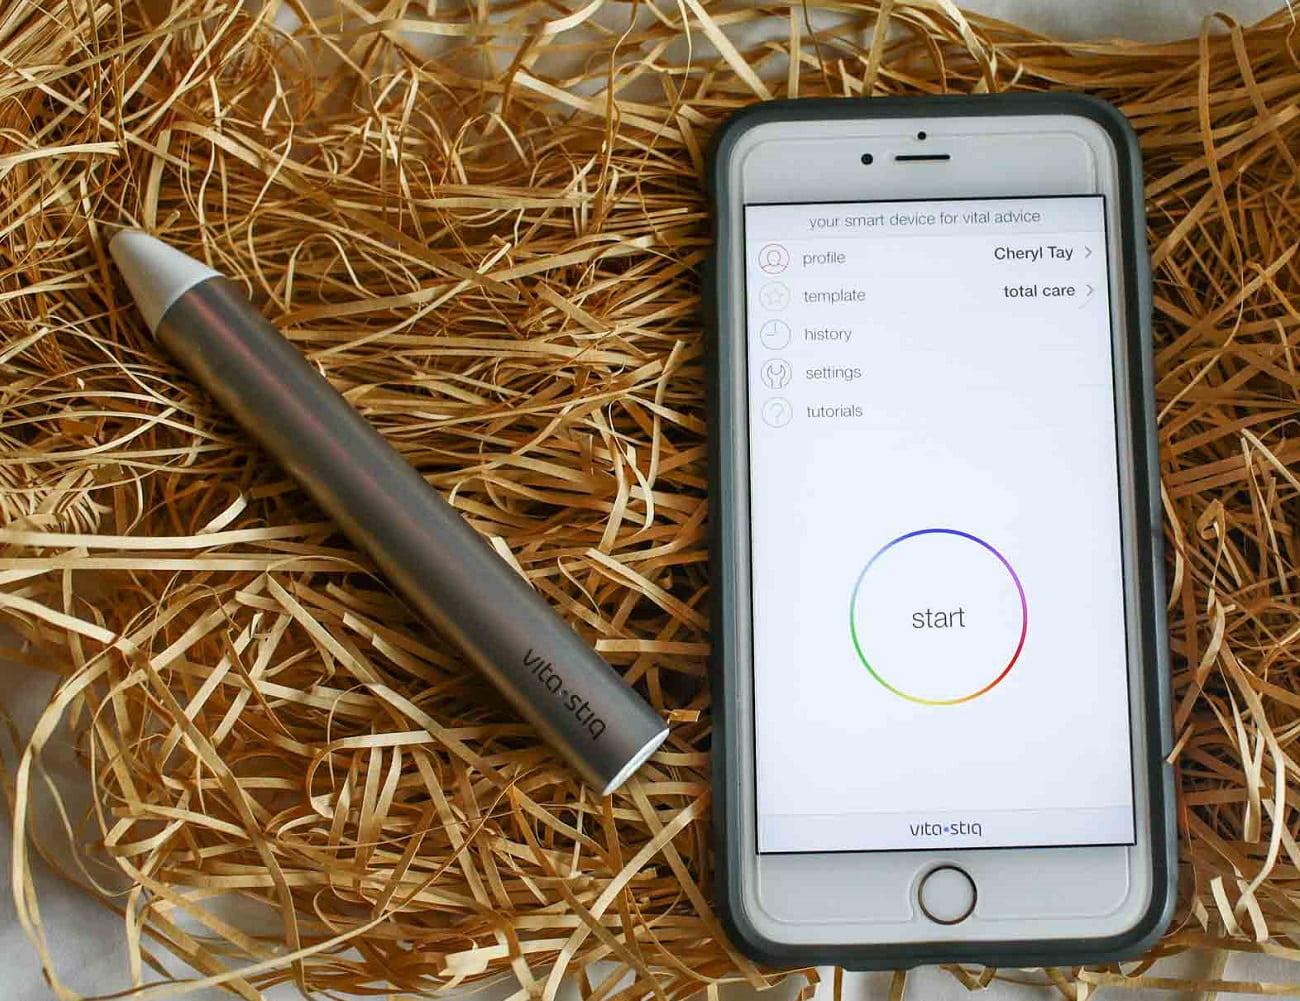 Vitastiq – A smart device for vital advice